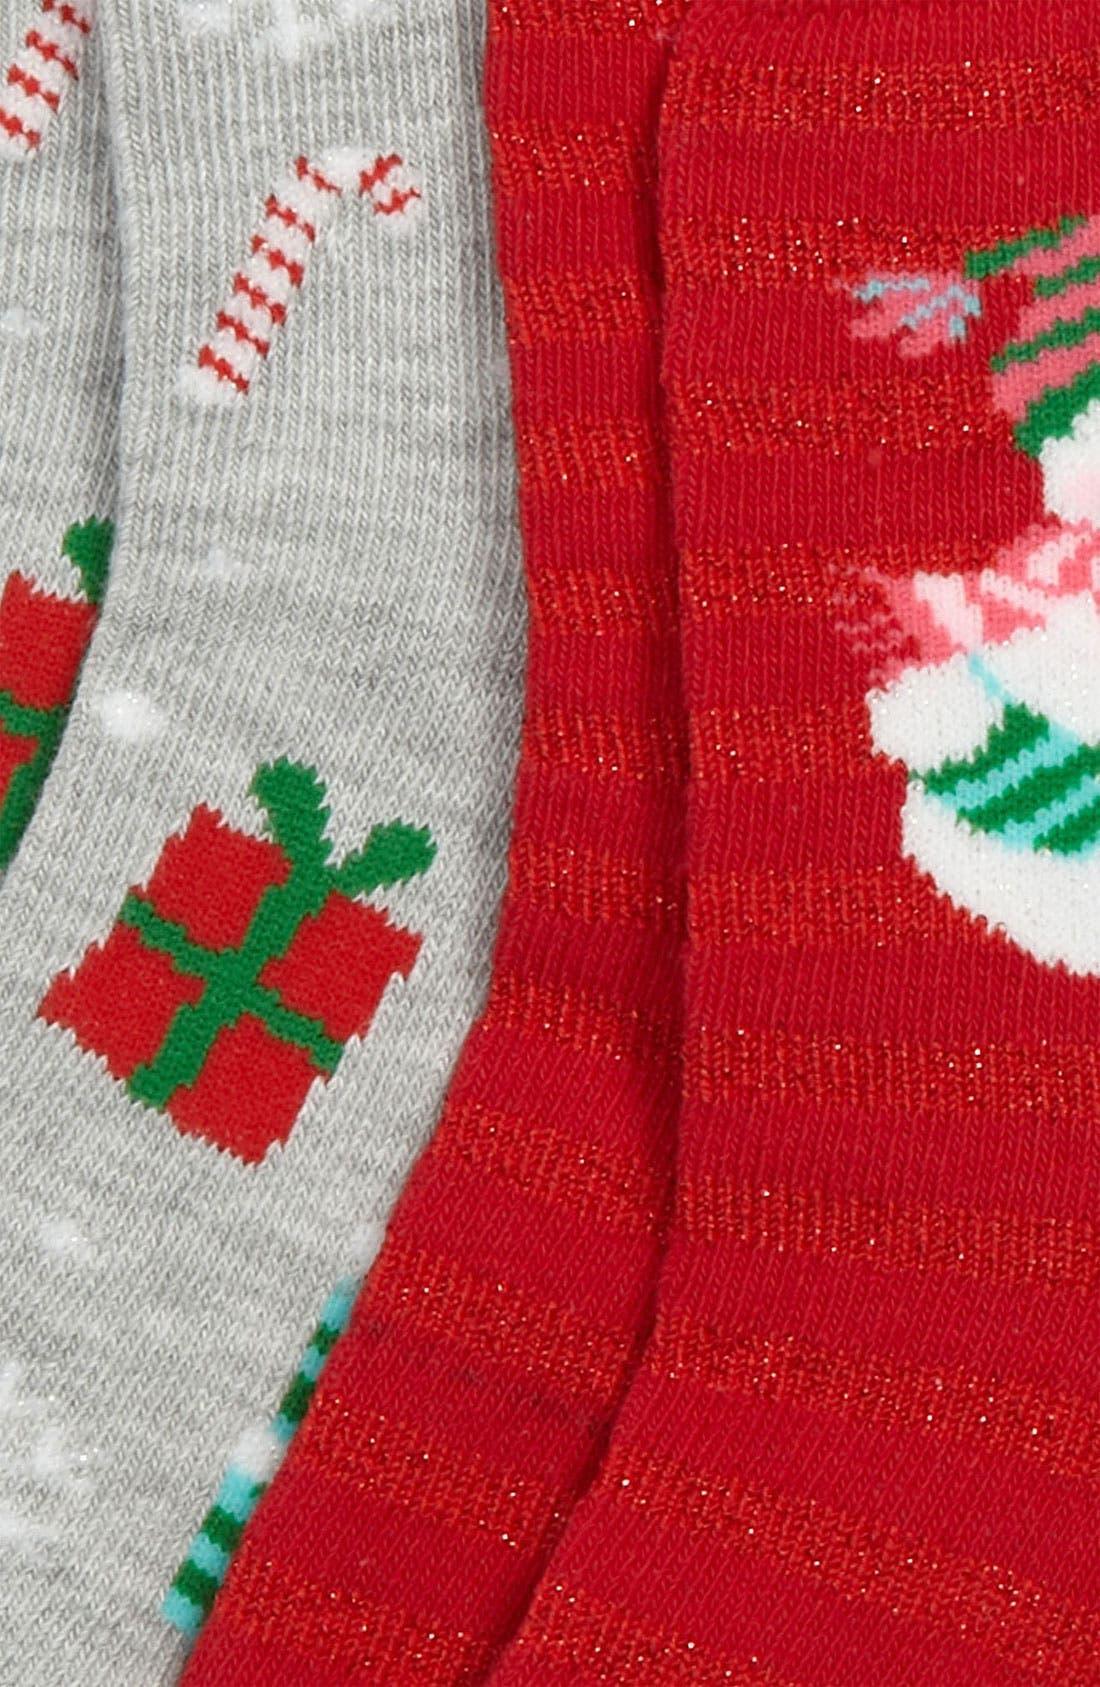 Alternate Image 2  - Nordstrom 'Snowman' Socks (2-Pack) (Walker, Toddler, Little Kid & Big Kid)